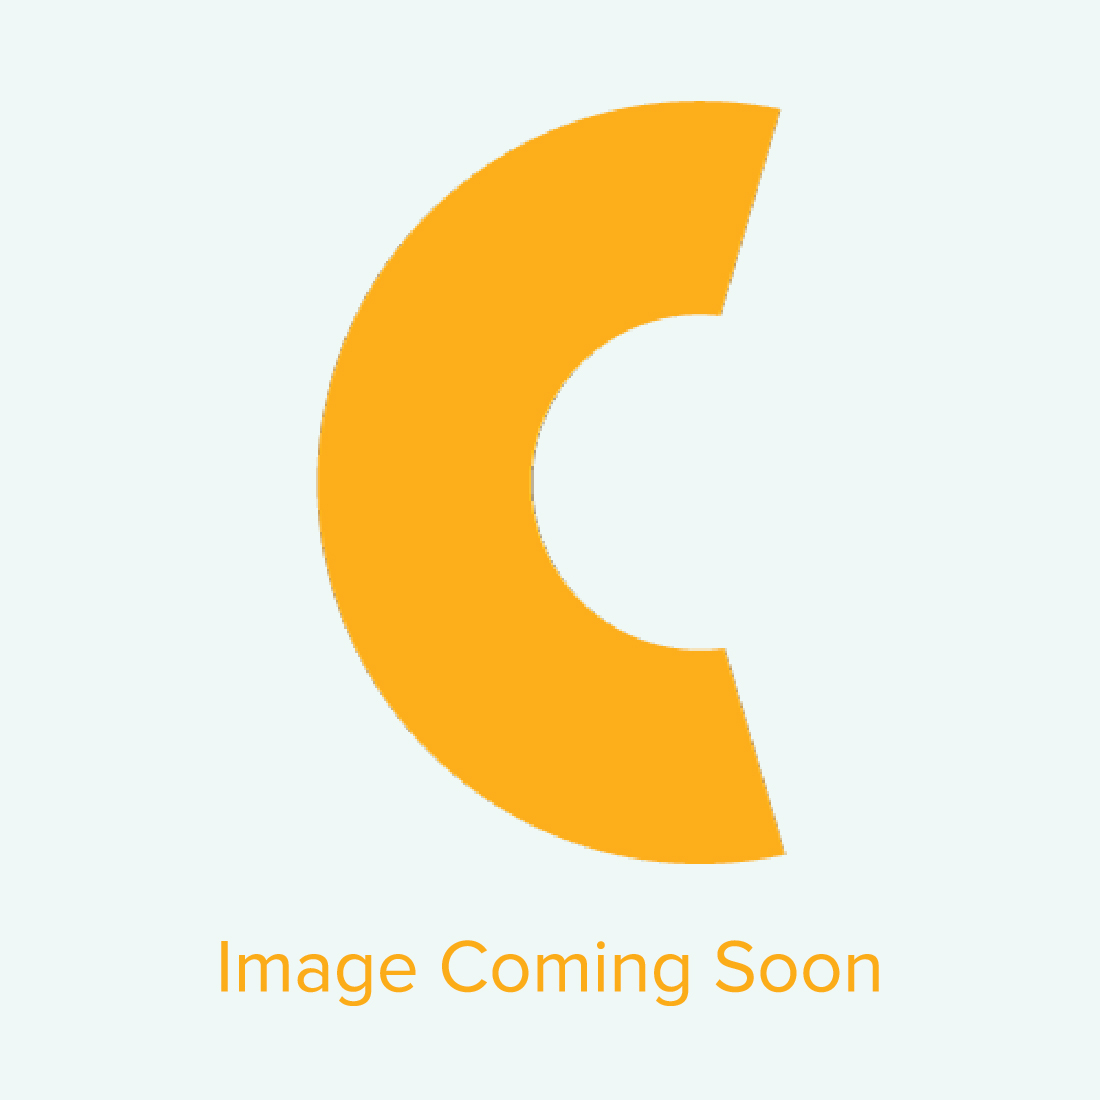 Media Catch Basket For Graphtec CE6000 120PLUS Cutter | Coastal Business  Supplies